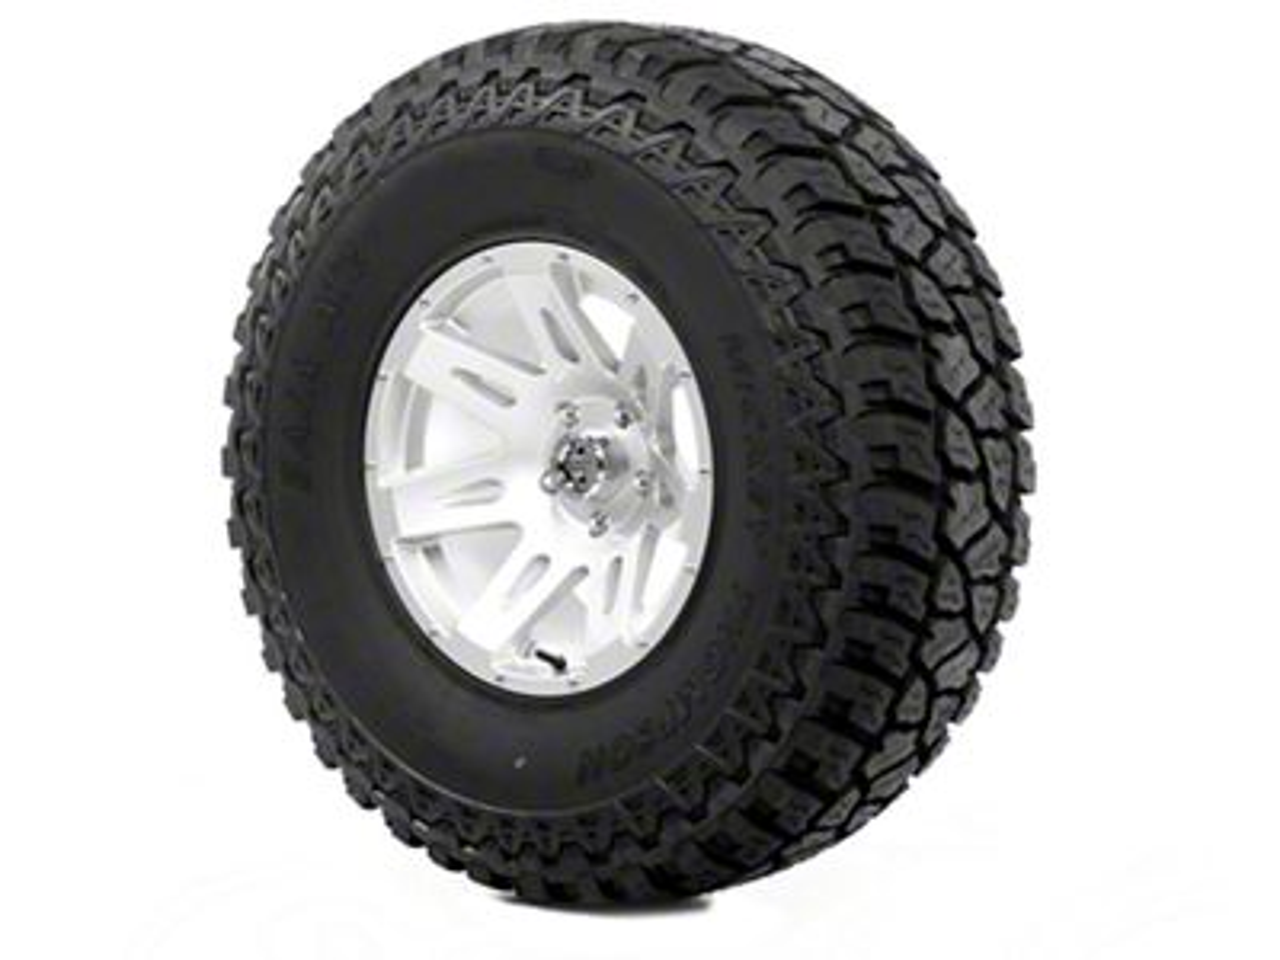 Rugged Ridge XHD Wheel 17x9 Silver and Mickey Thompson ATZ P3 37x12.50x17 Tire (07-18 Jeep Wrangler JK)